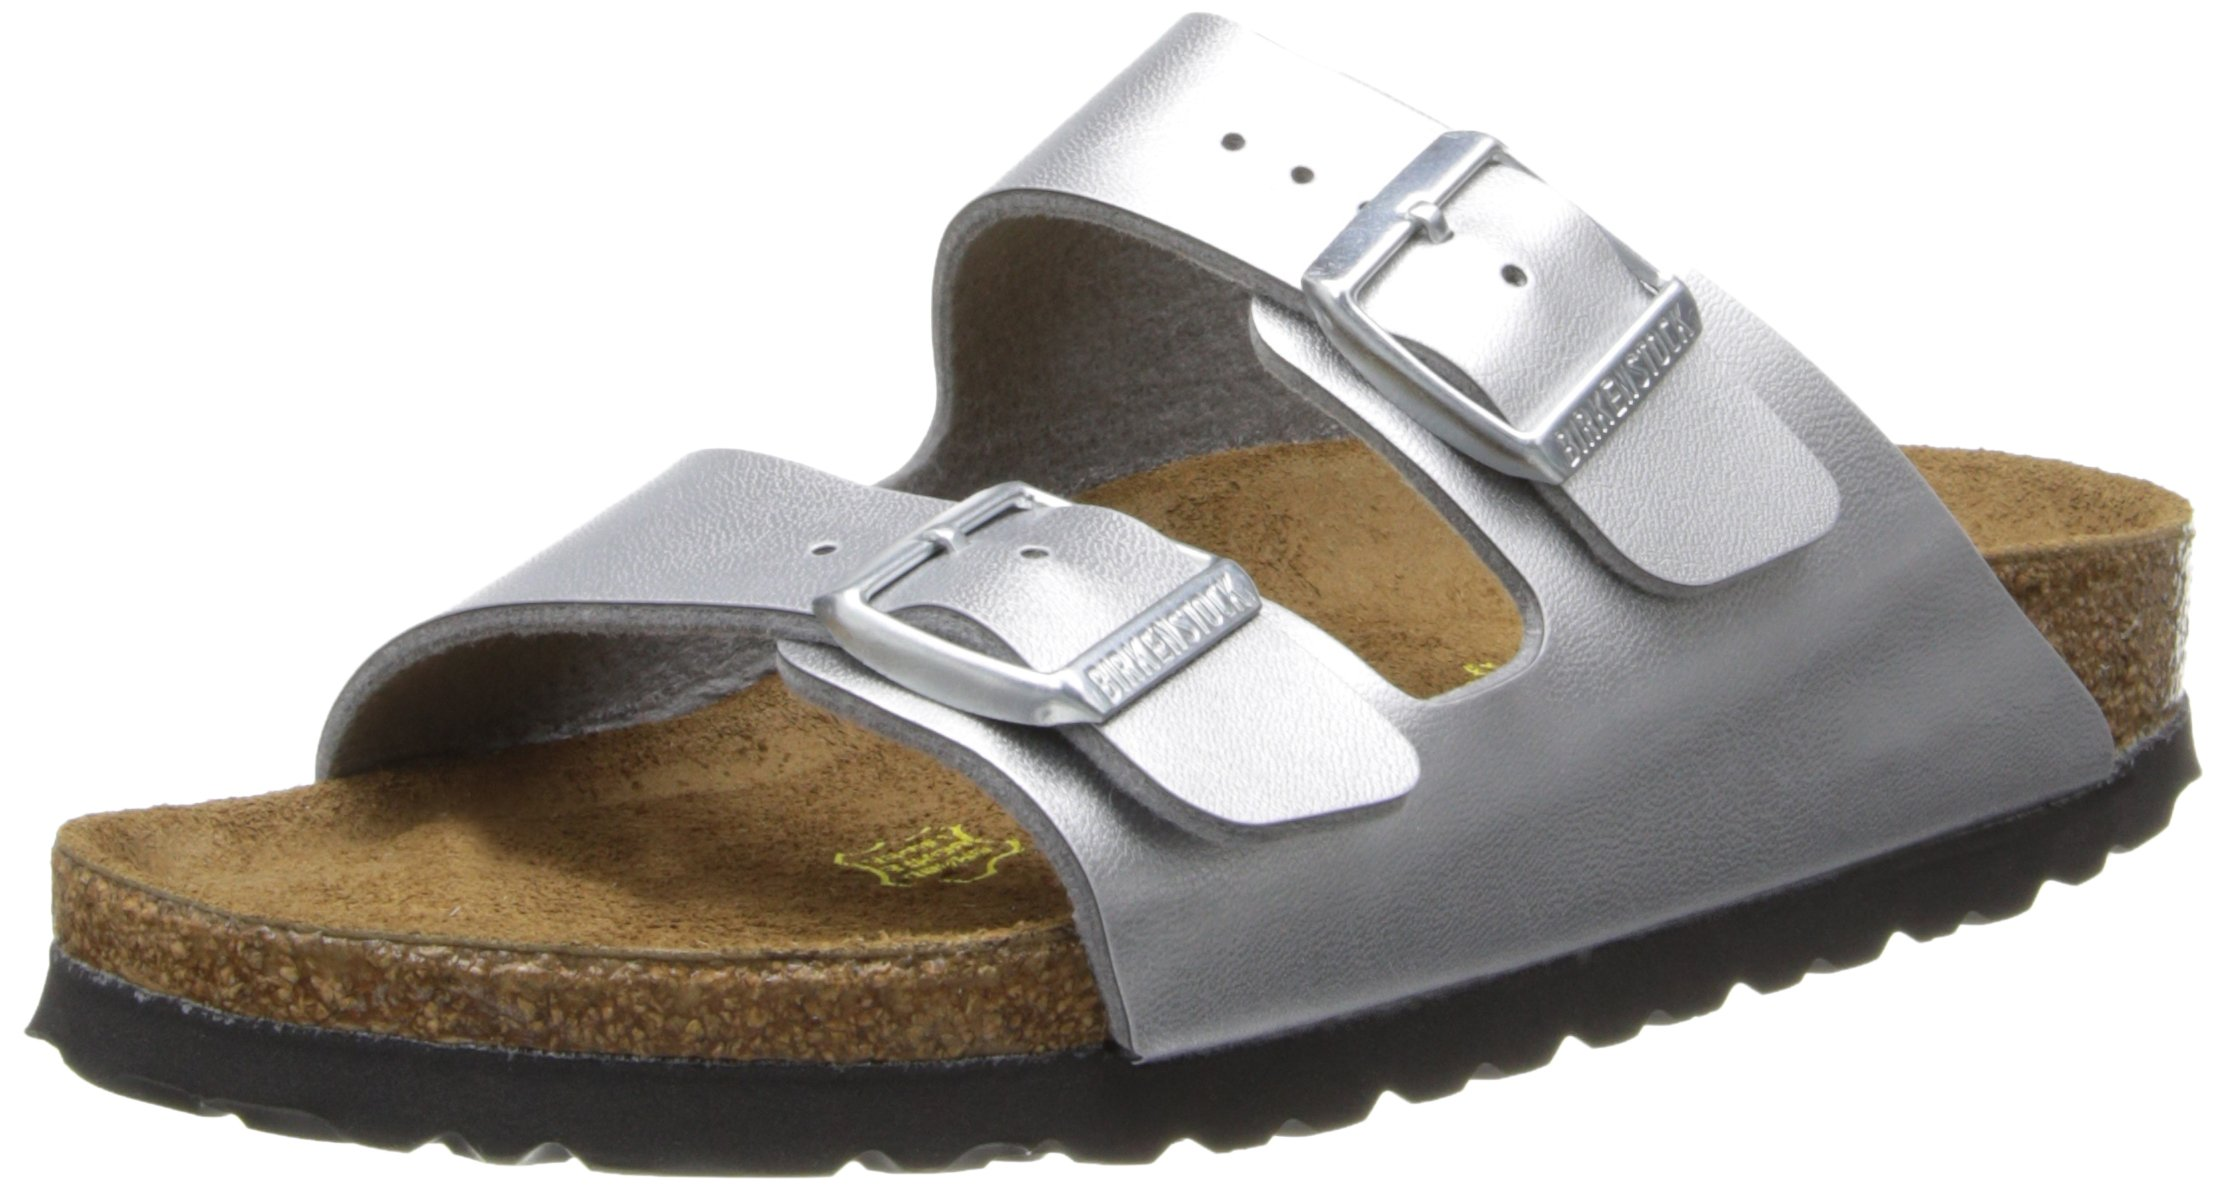 Birkenstock Unisex Arizona Silver Sandals - 39 N EU / 8-8.5 2A(N) US